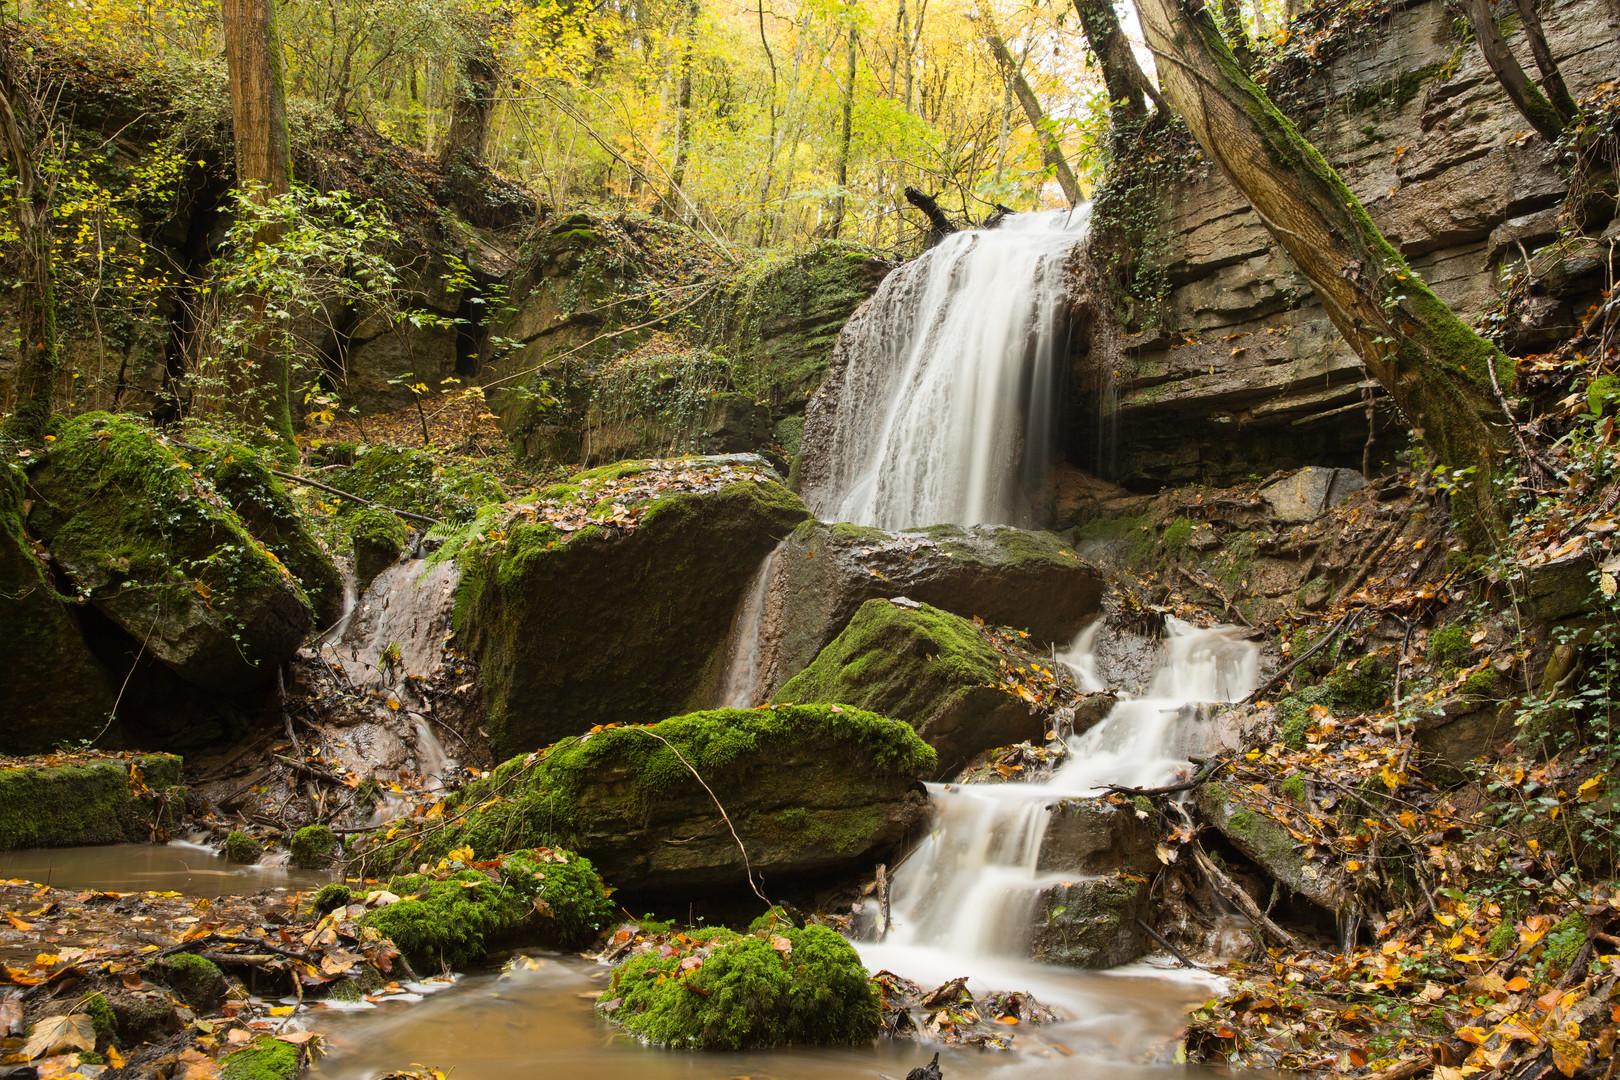 Wasserfall bei Wallendorf/ Eifel